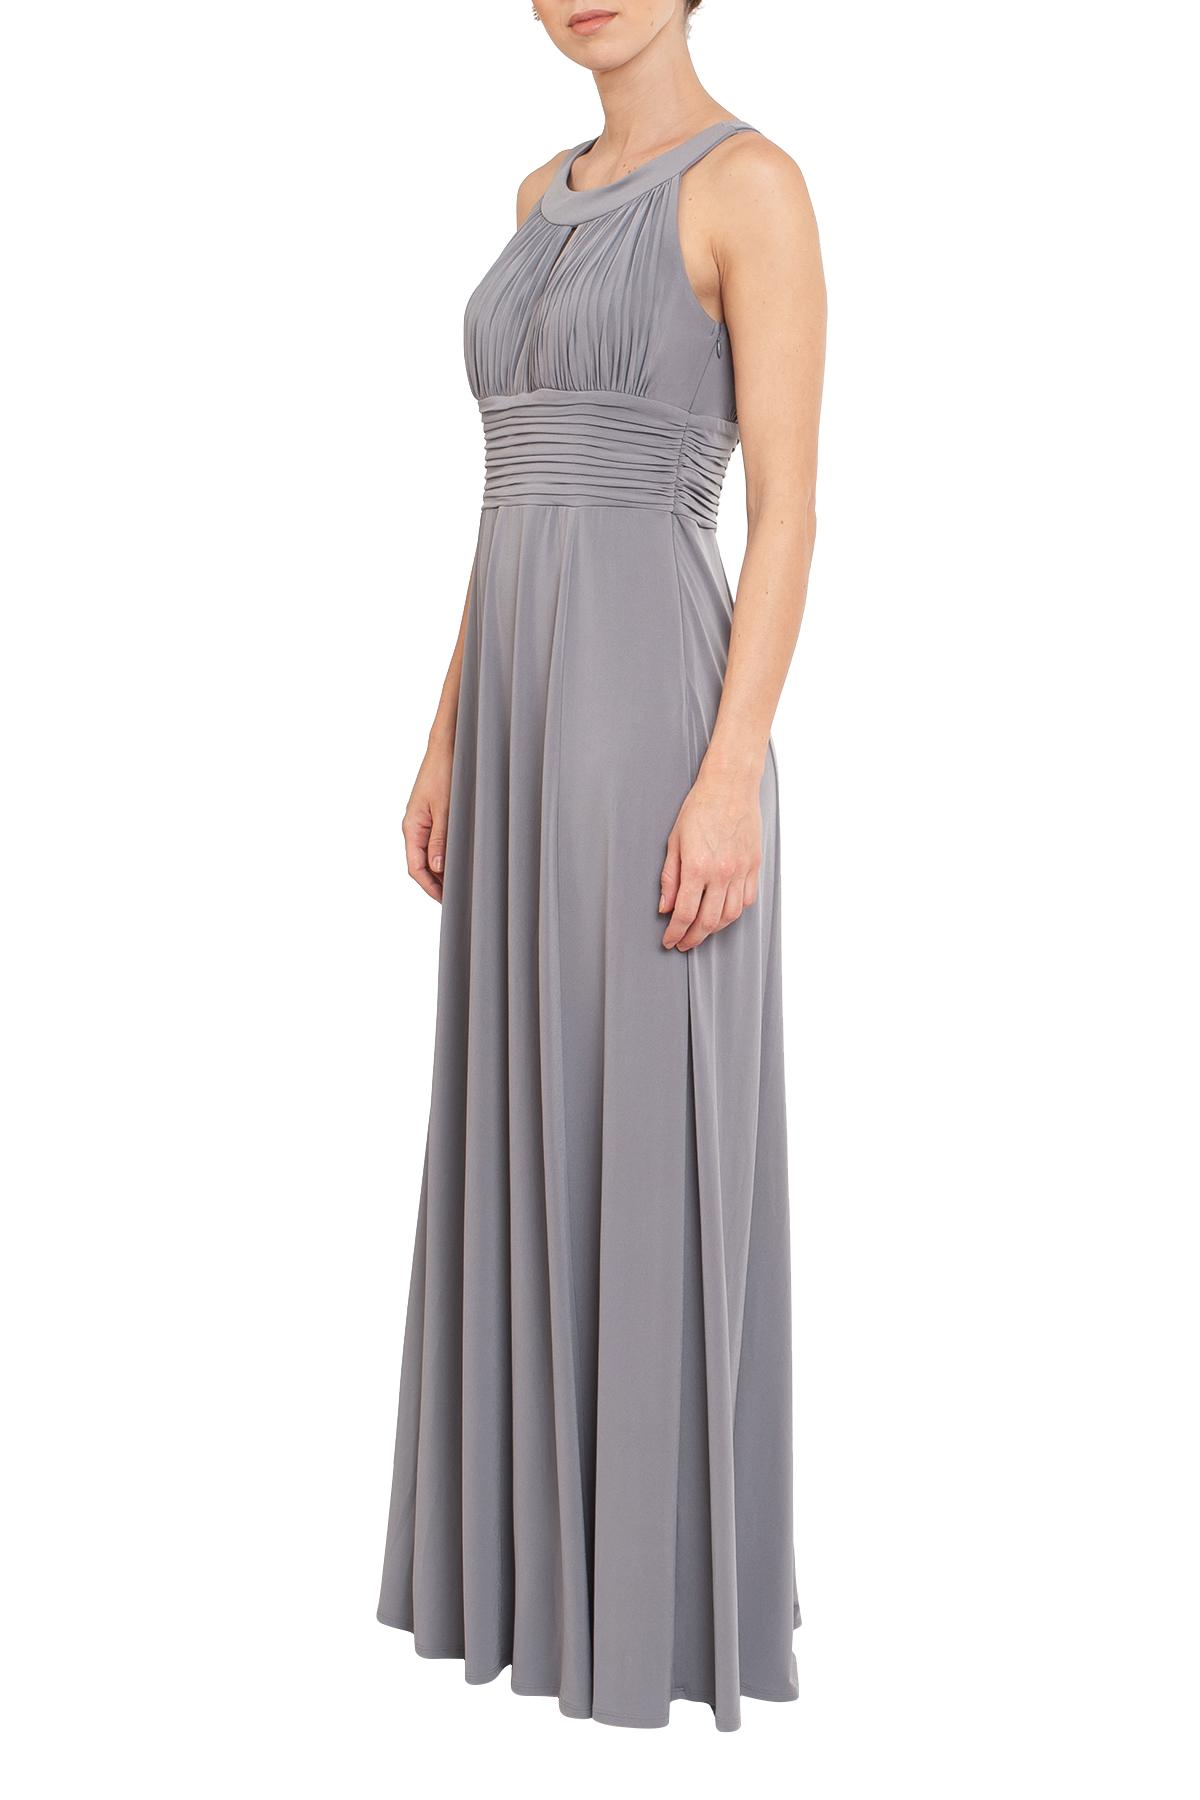 Vestido Ceridono Basic Collection